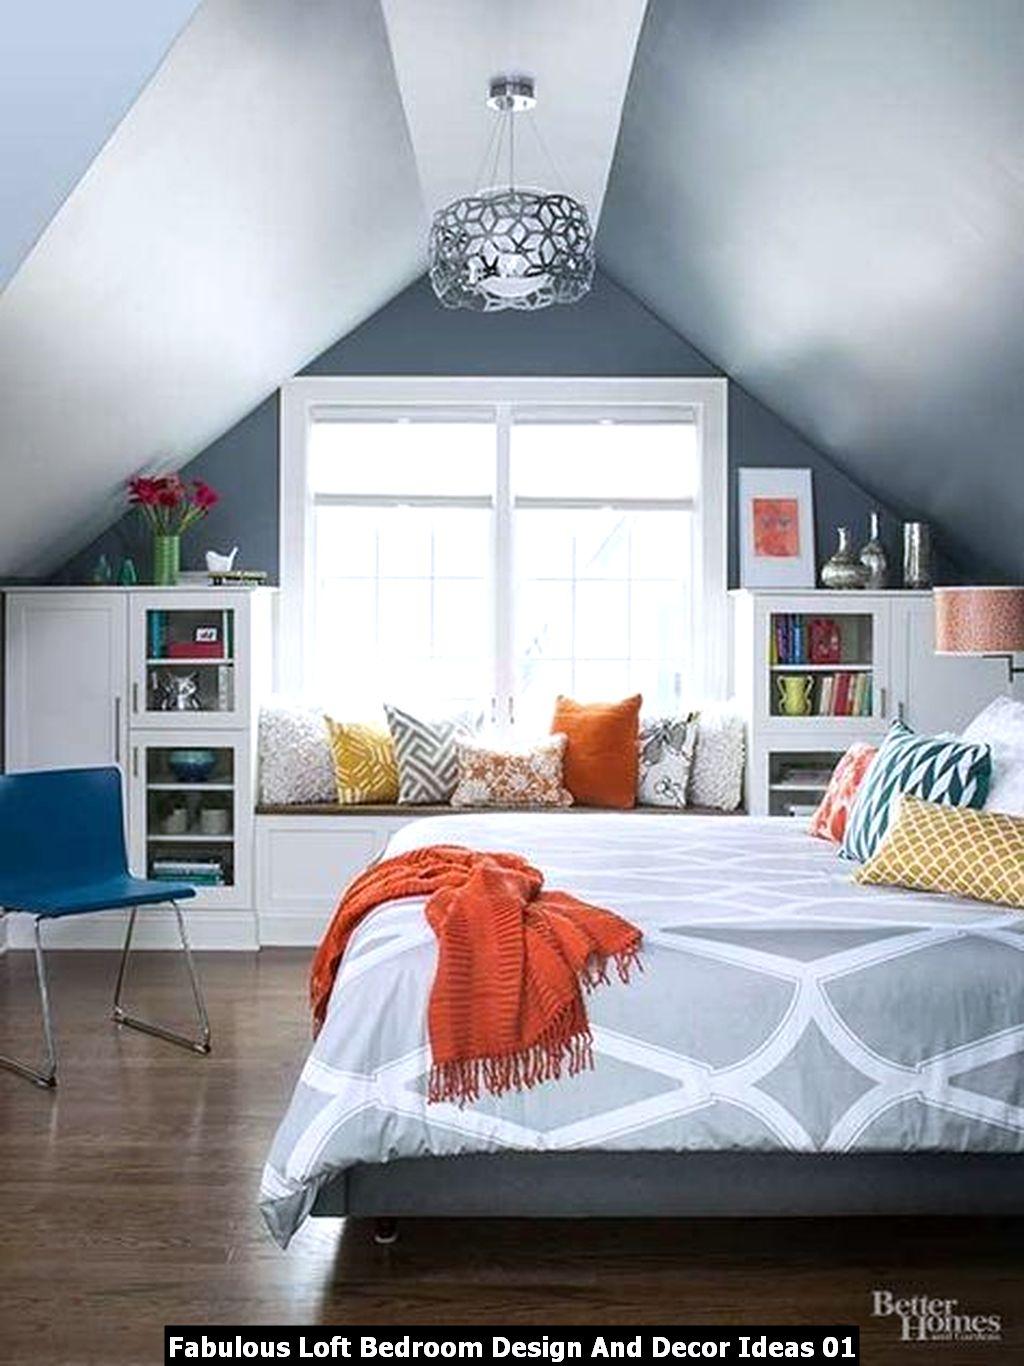 Fabulous Loft Bedroom Design And Decor Ideas 01